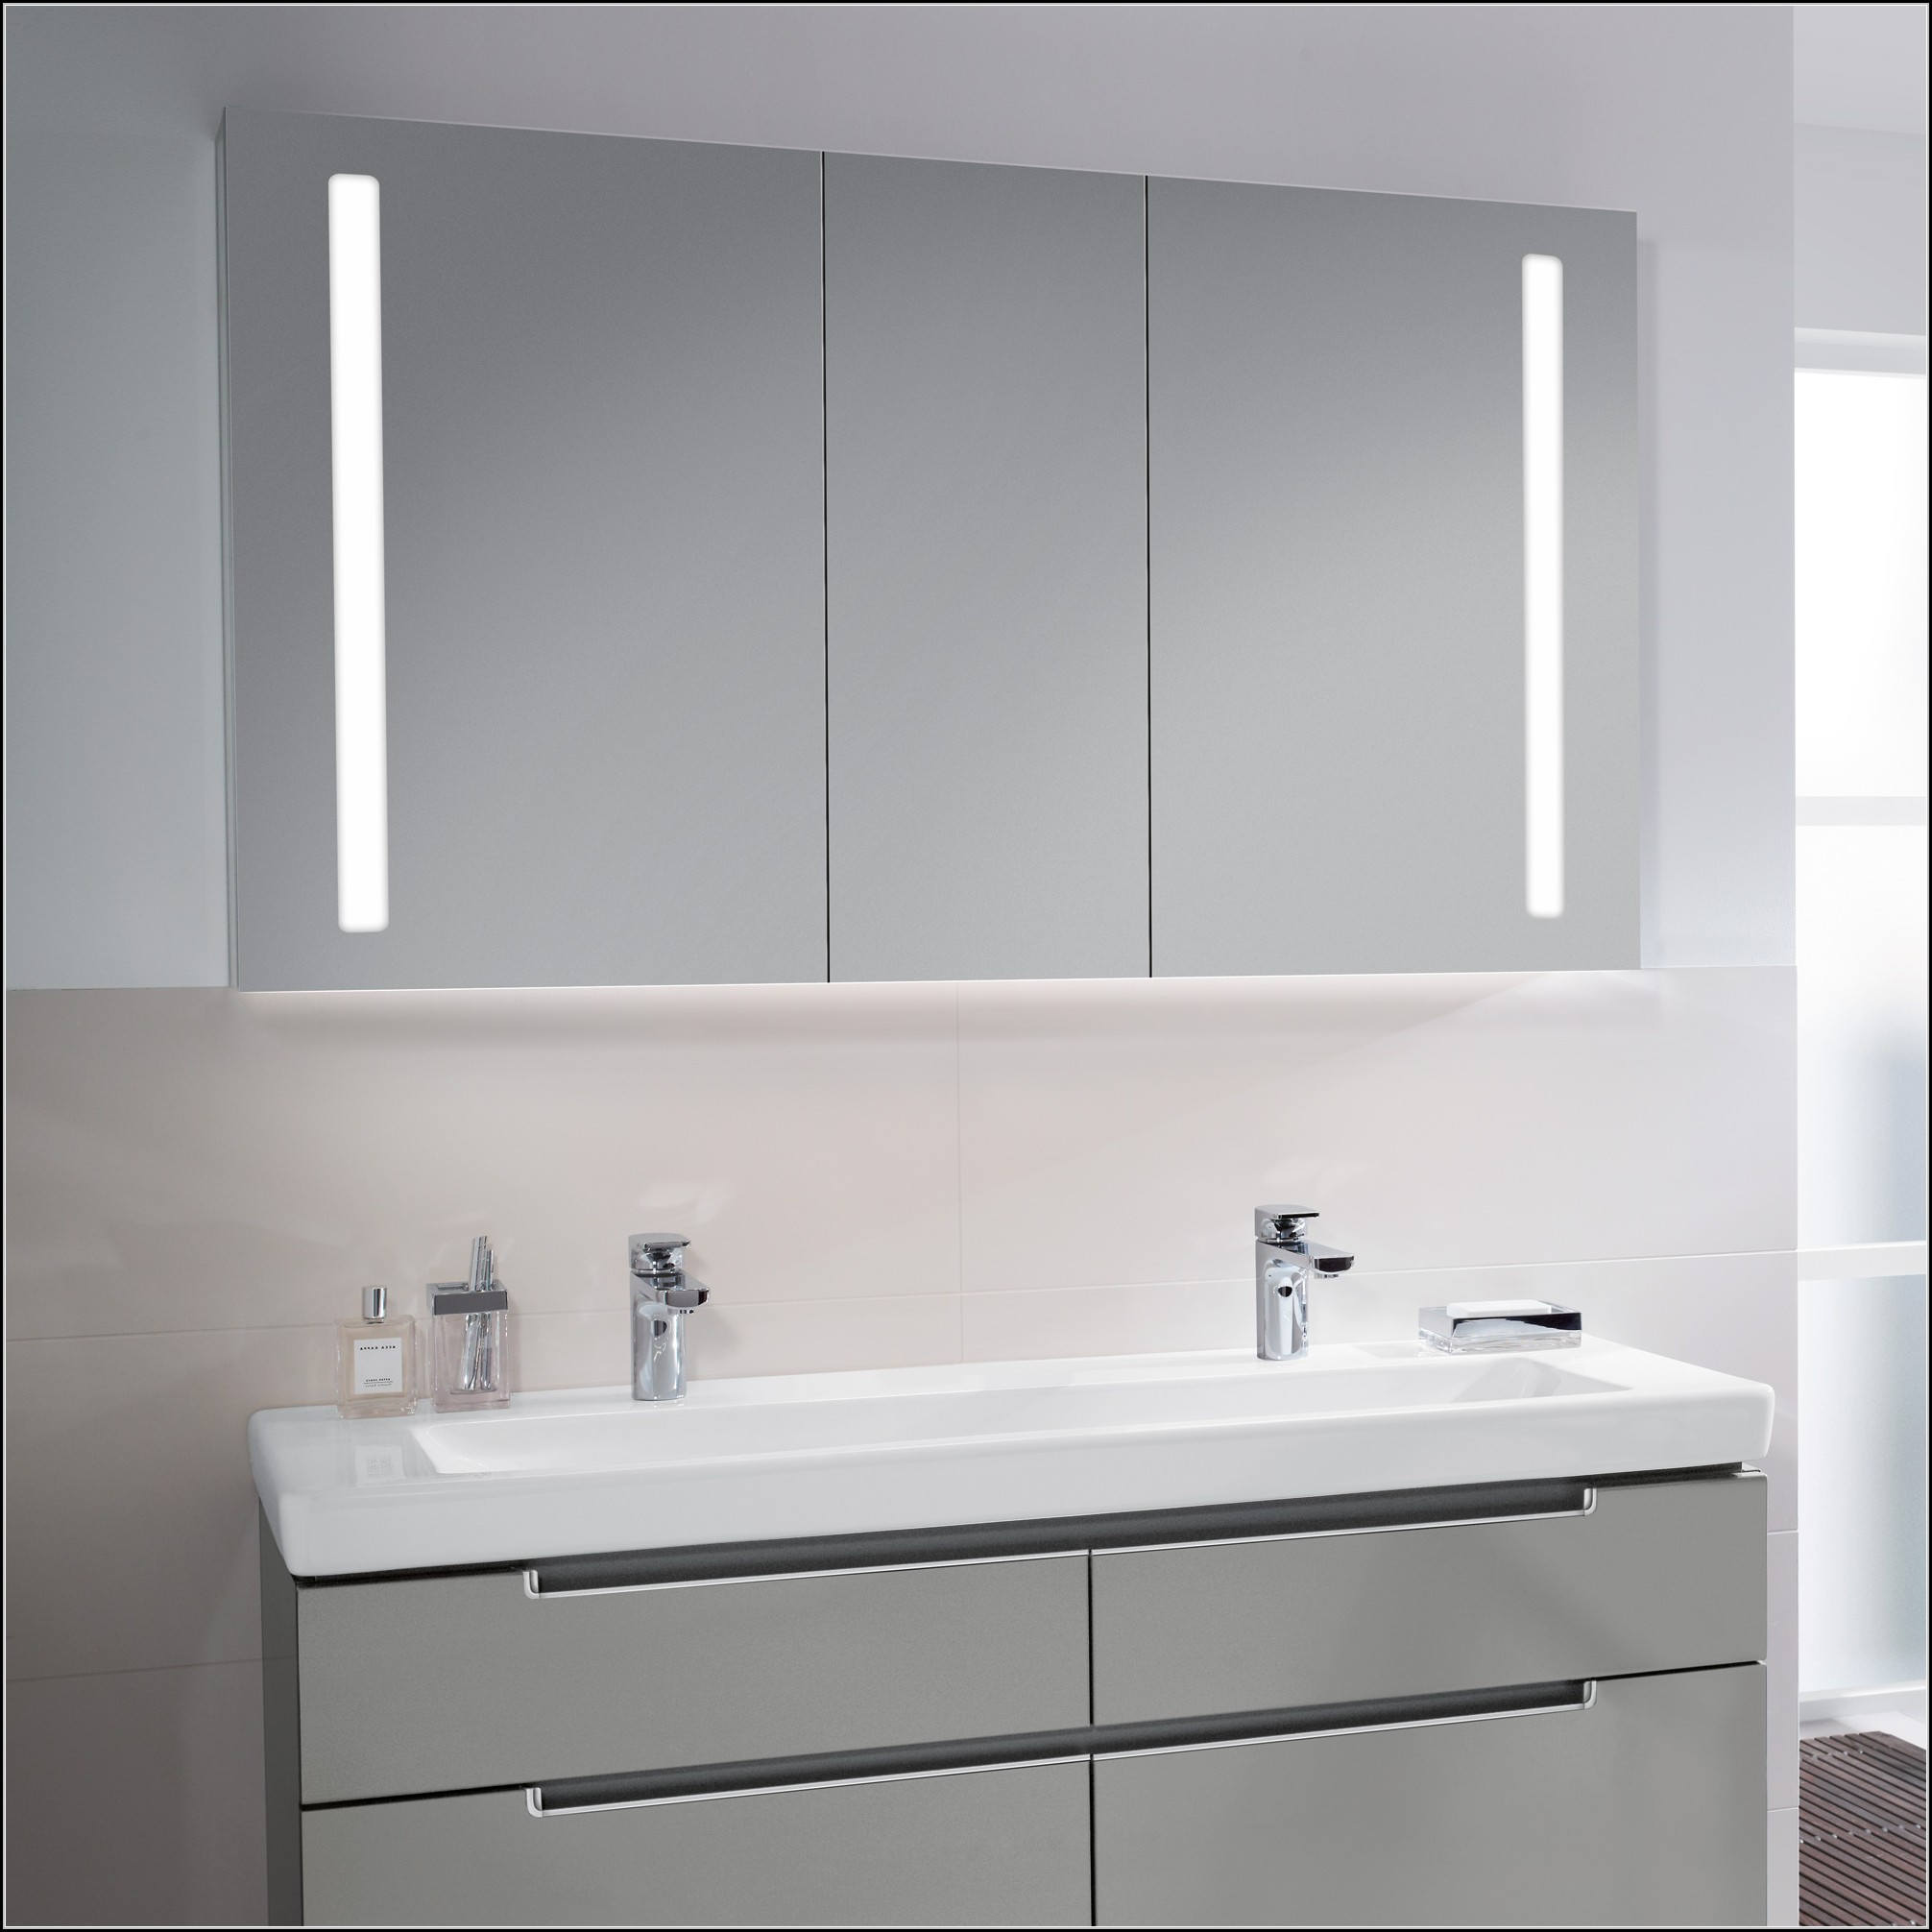 villeroy boch my view spiegelschrank mit led beleuchtung. Black Bedroom Furniture Sets. Home Design Ideas